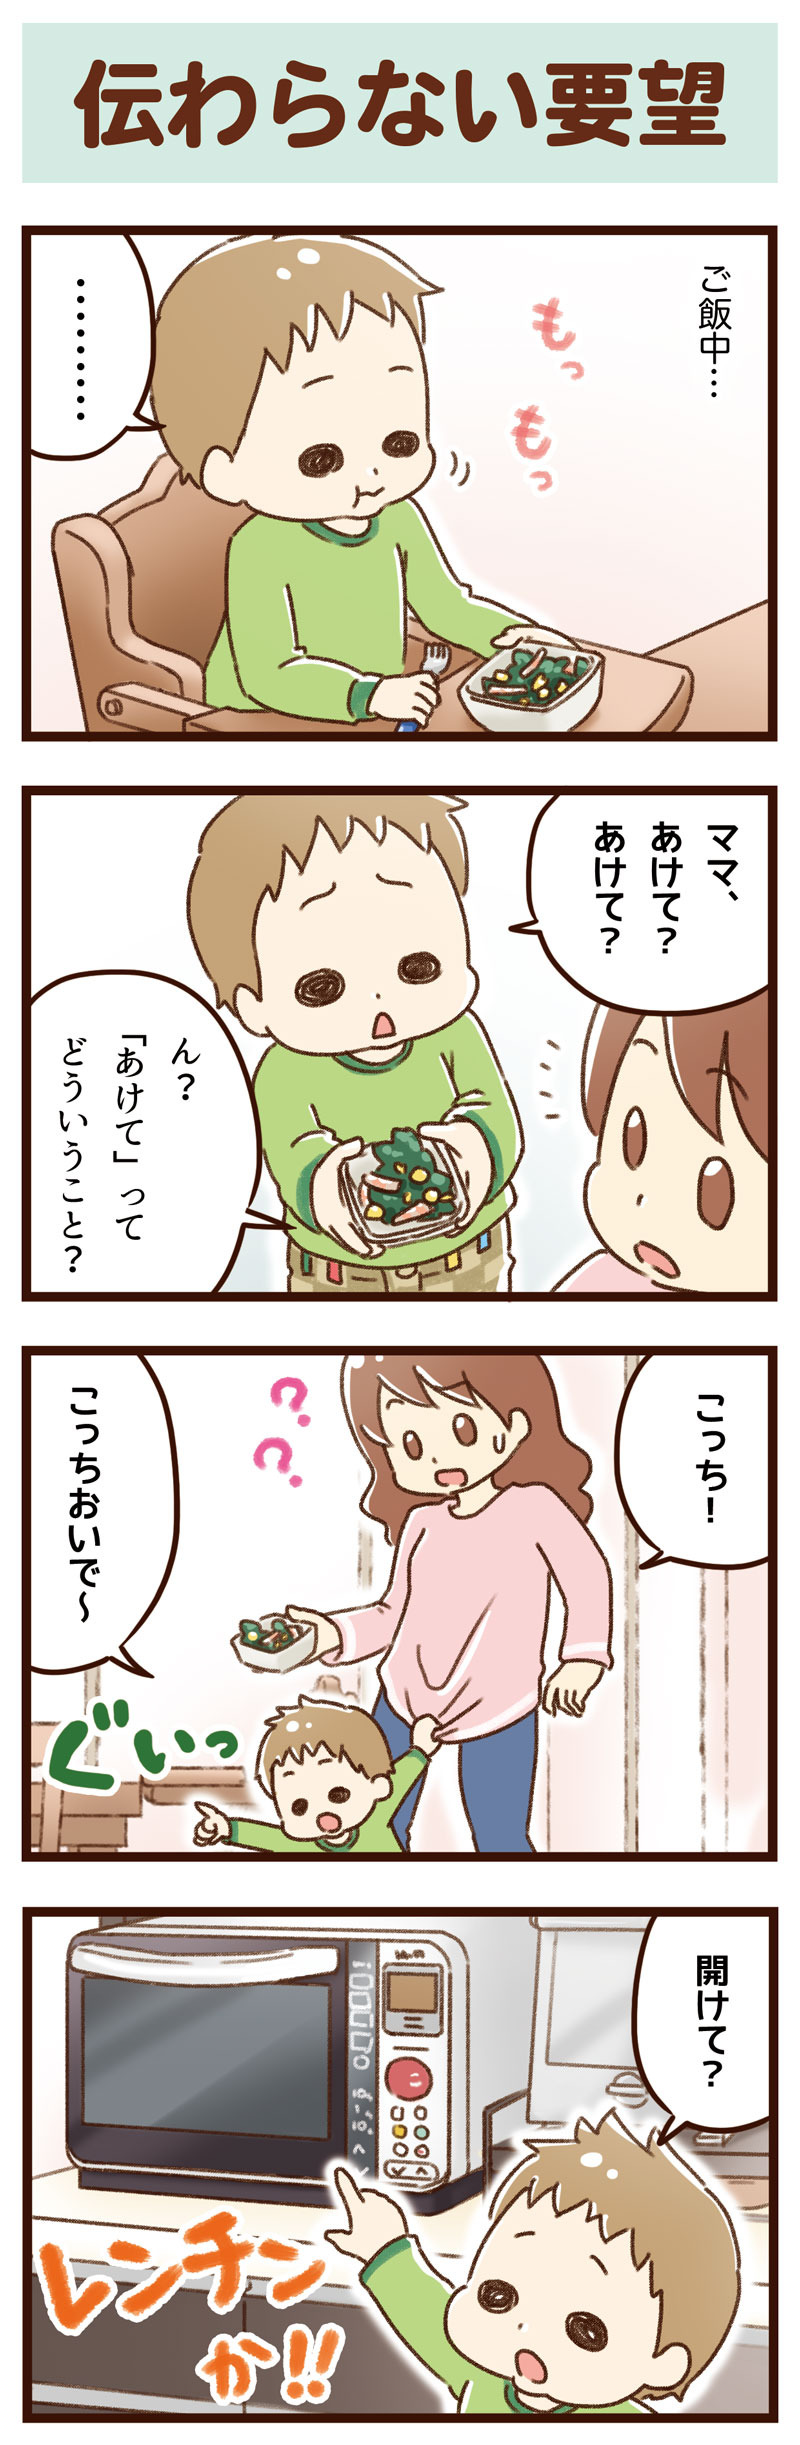 yumui264-1